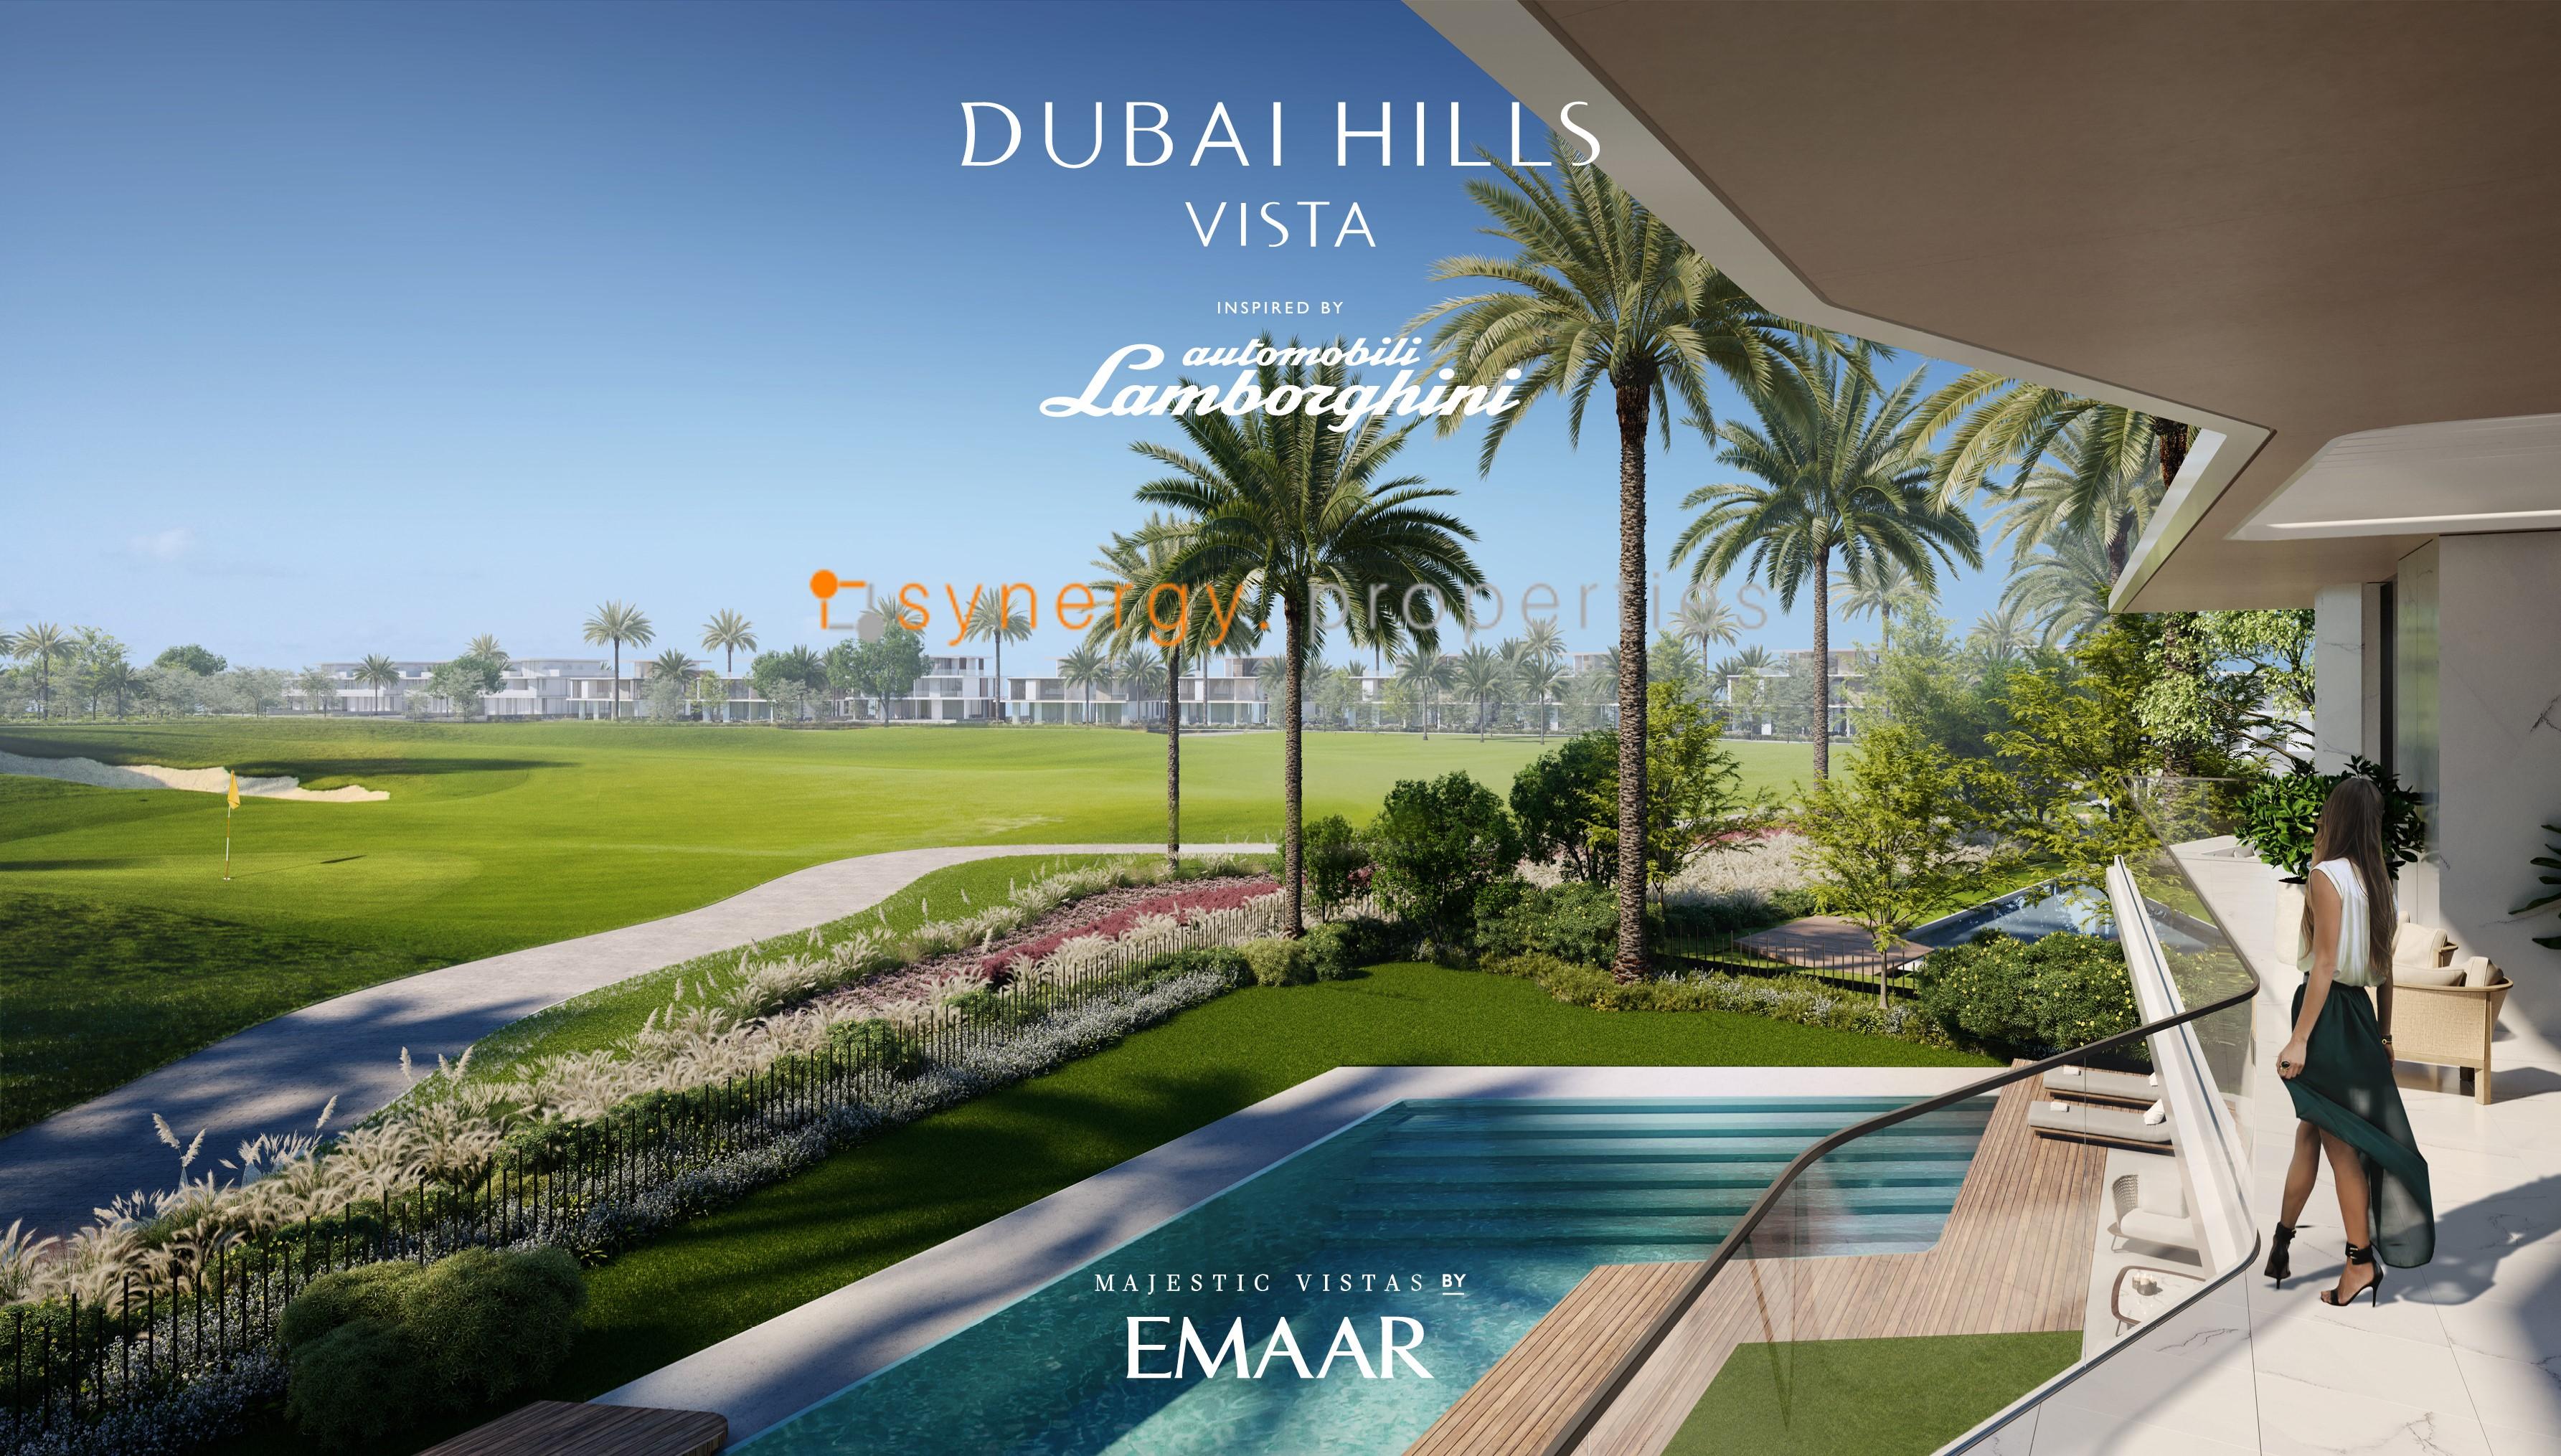 Dubai Hills Vista